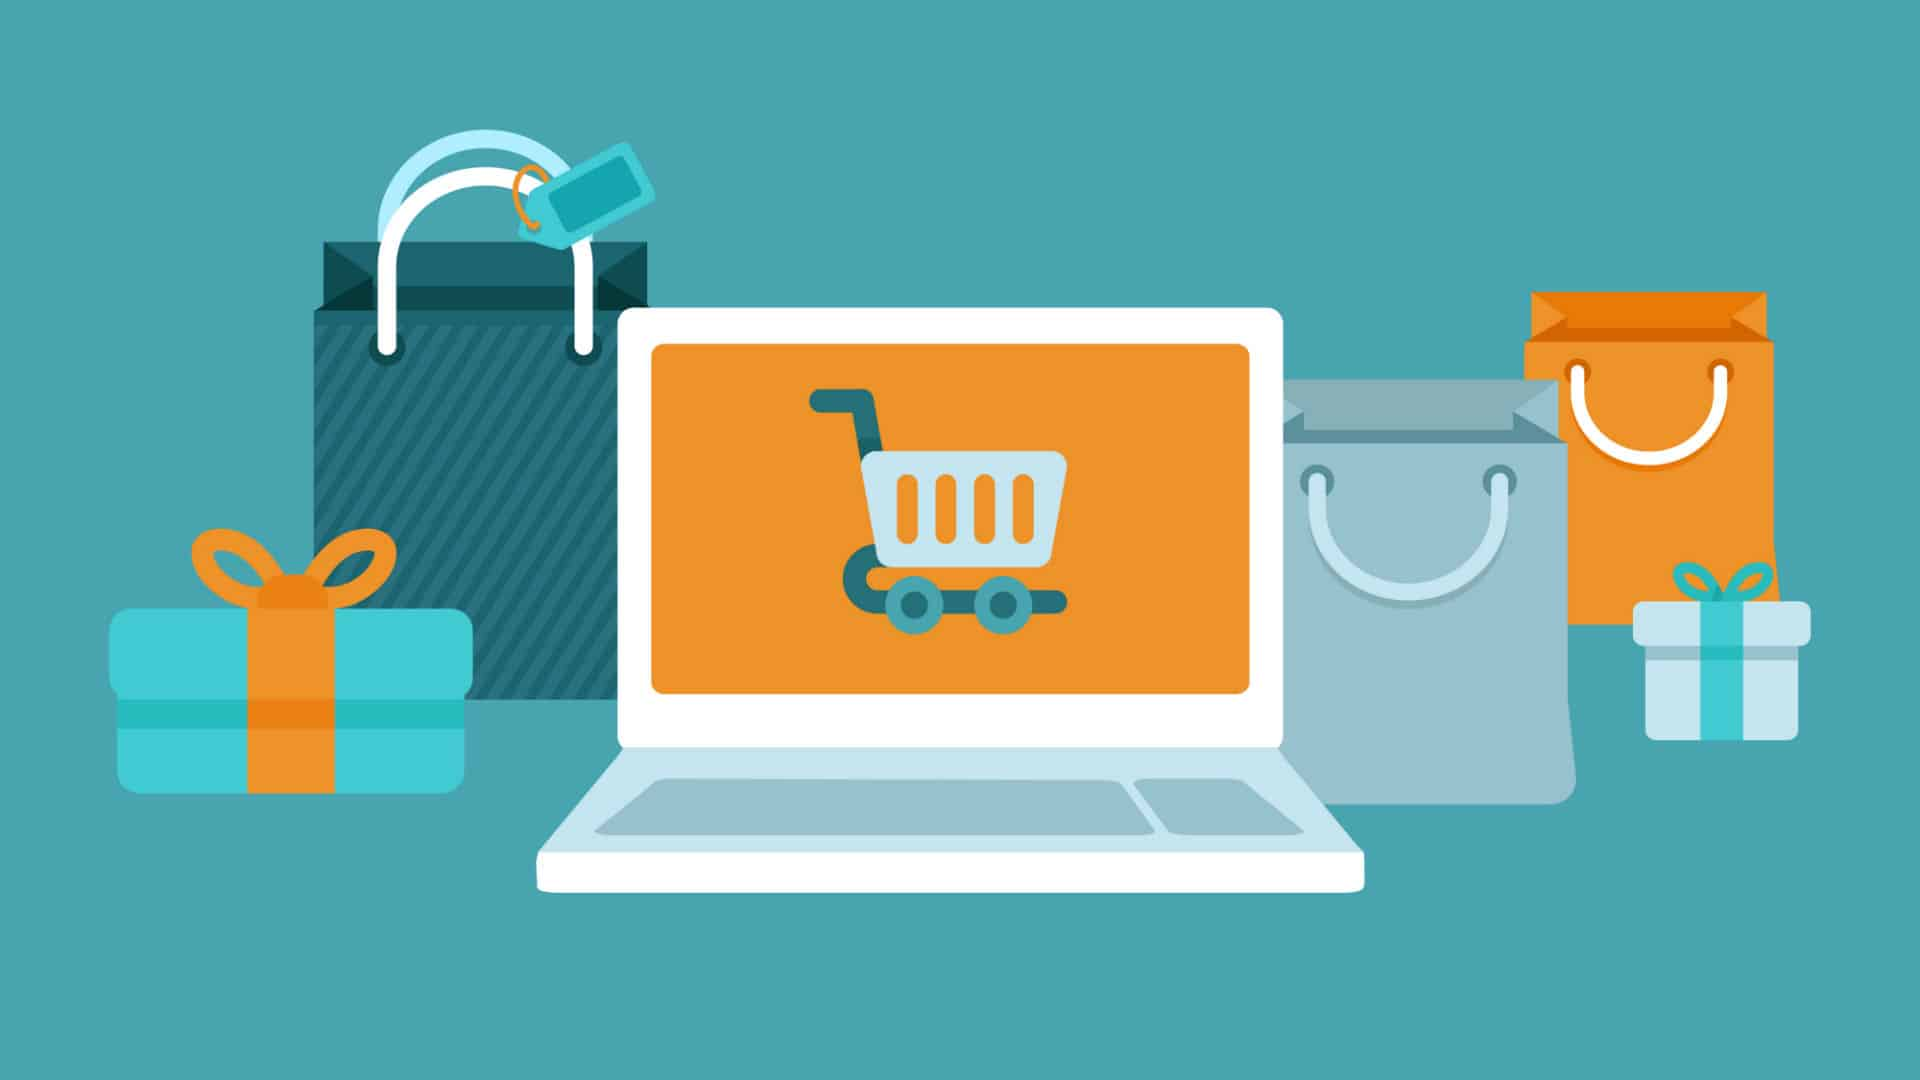 e-ticarette-en-cok-satilan-urunler-teknoloji